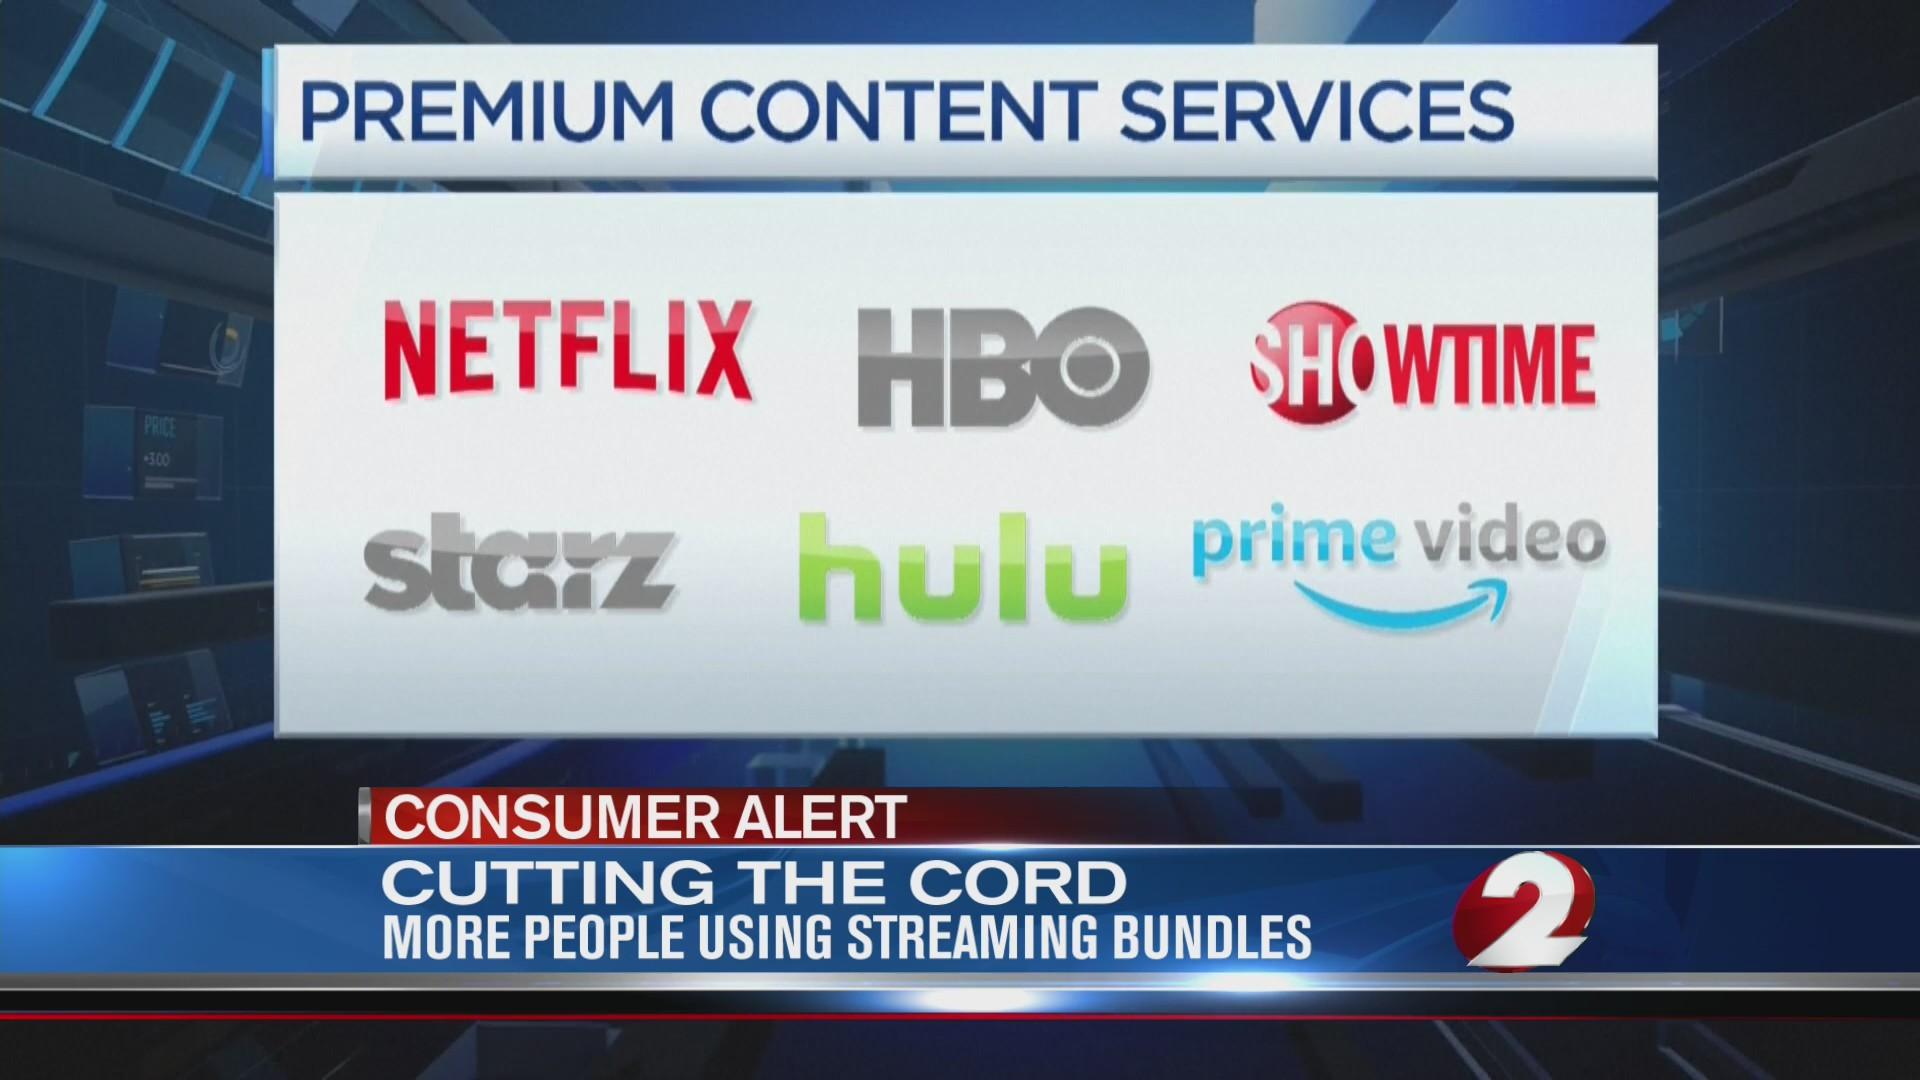 More people using streaming bundles